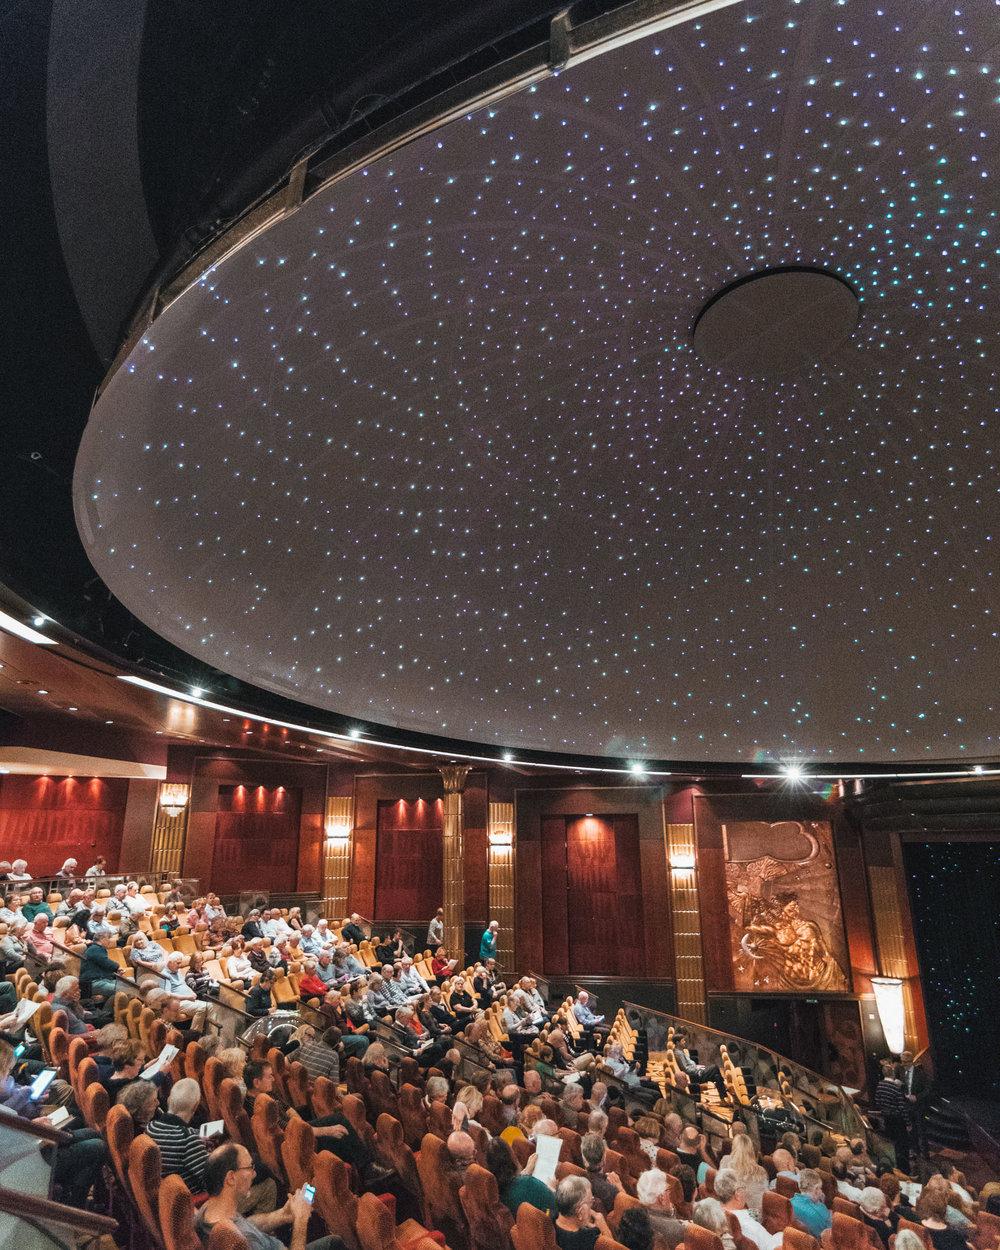 Planetarium // Transatlantic Cruising on the Cunard Queen Mary 2 #readysetjetset